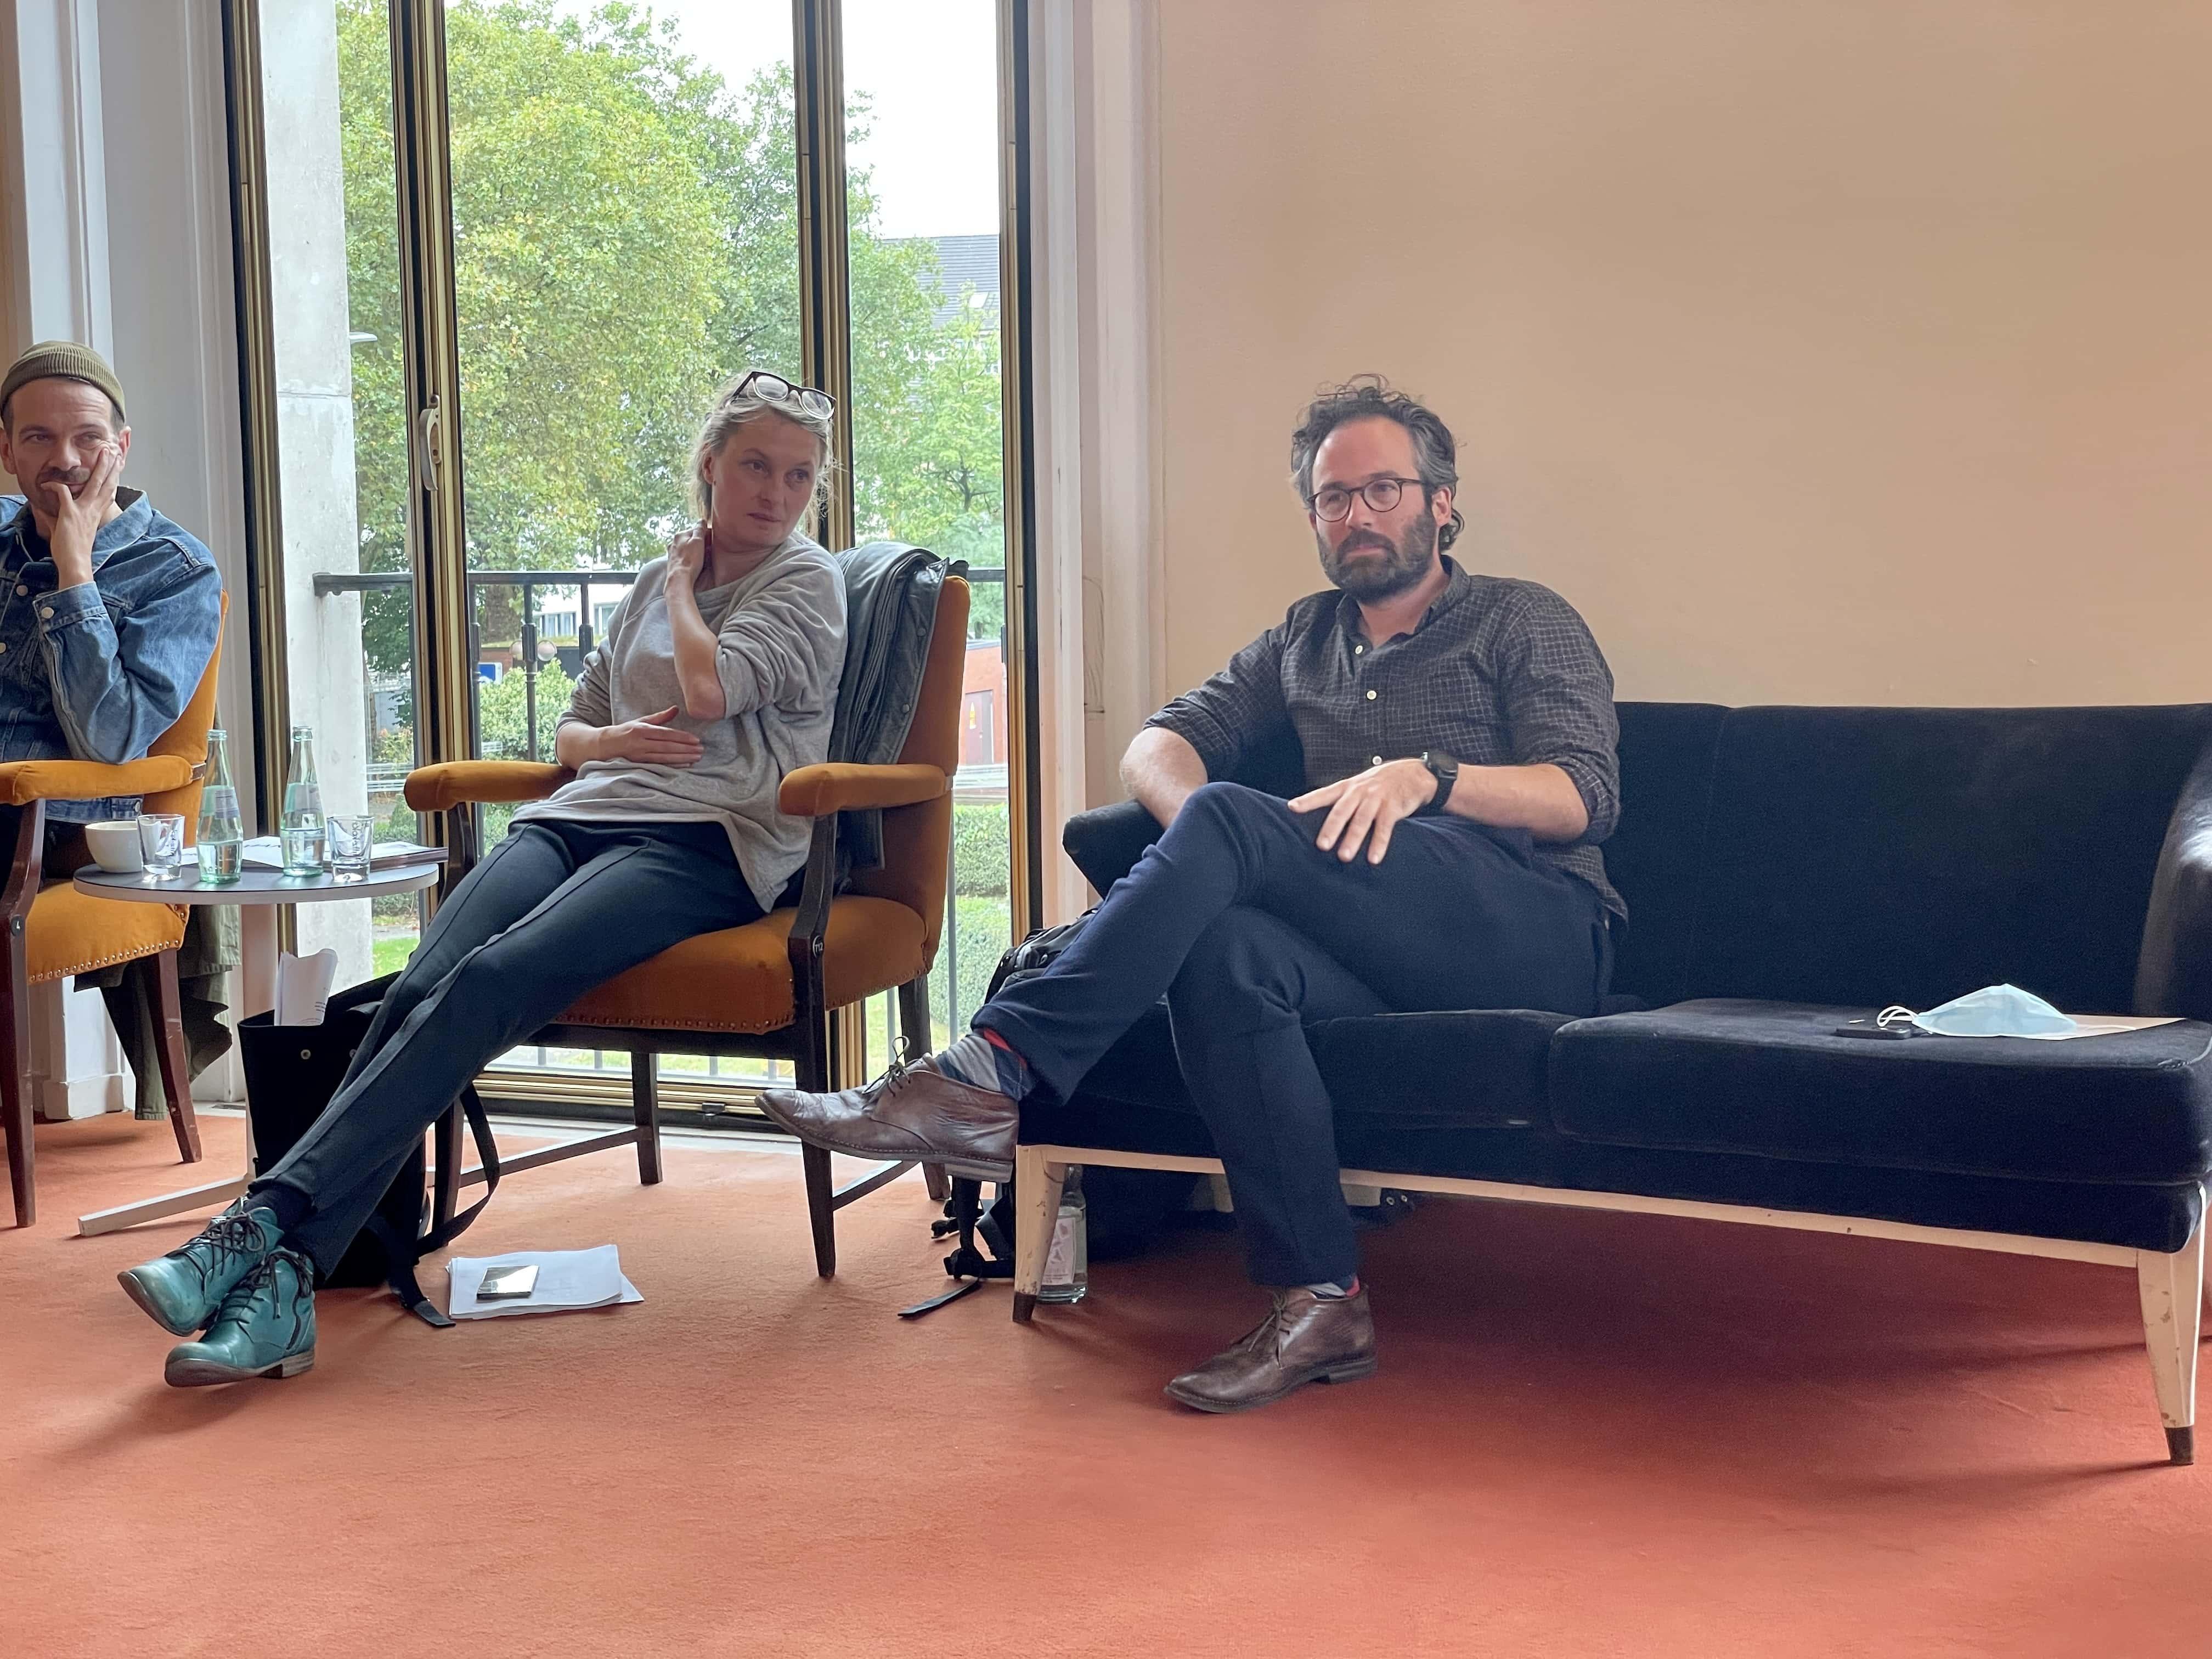 Schauspielhaus Bochum (Pressekonferenz zu den Oktober-Premieren): Robert Borgmann, Angela Obst, Guy Clemens